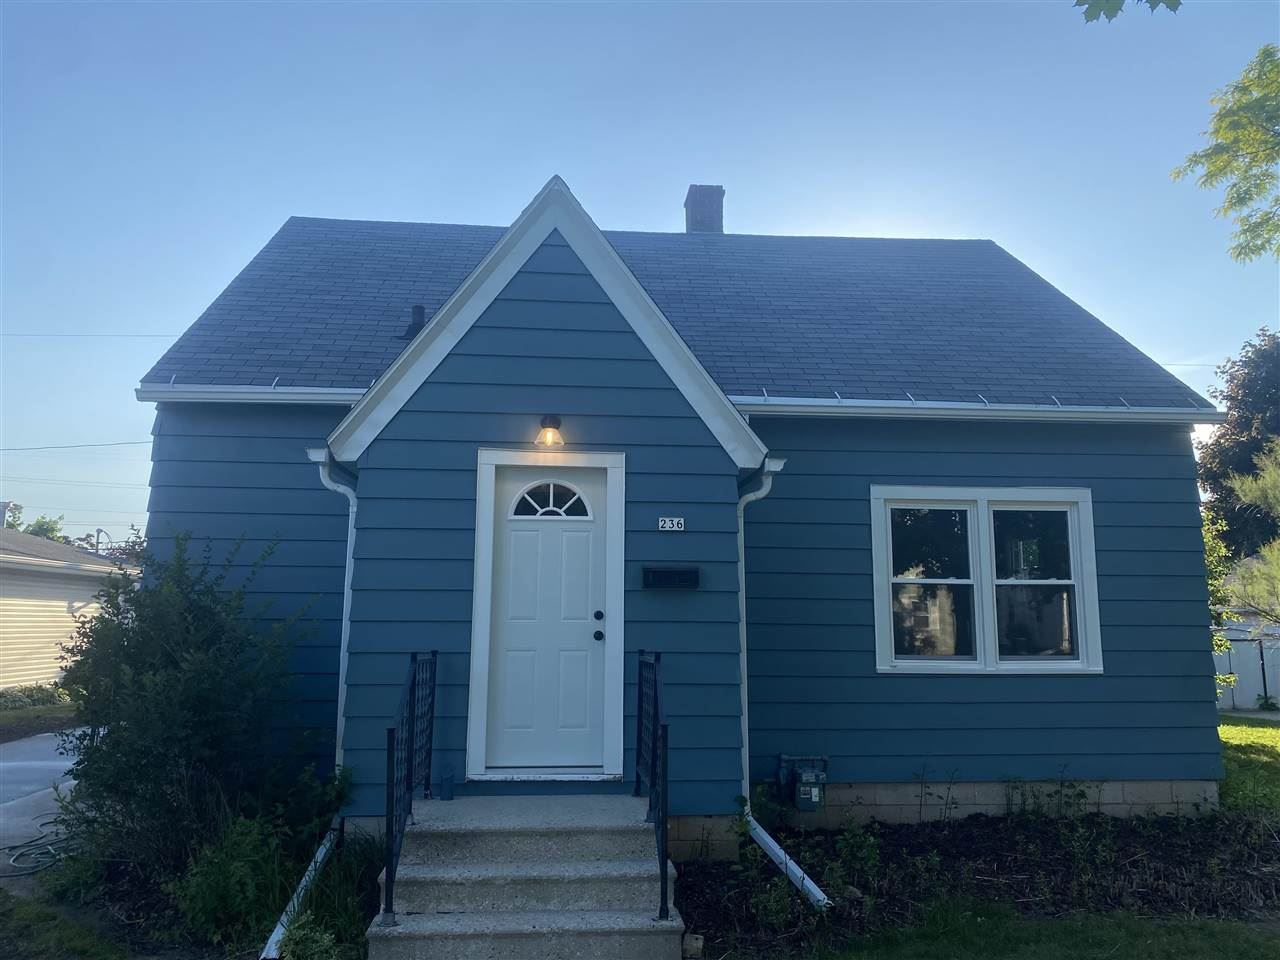 236 S JOHN Street, Kimberly, WI 54136 - MLS#: 50241919